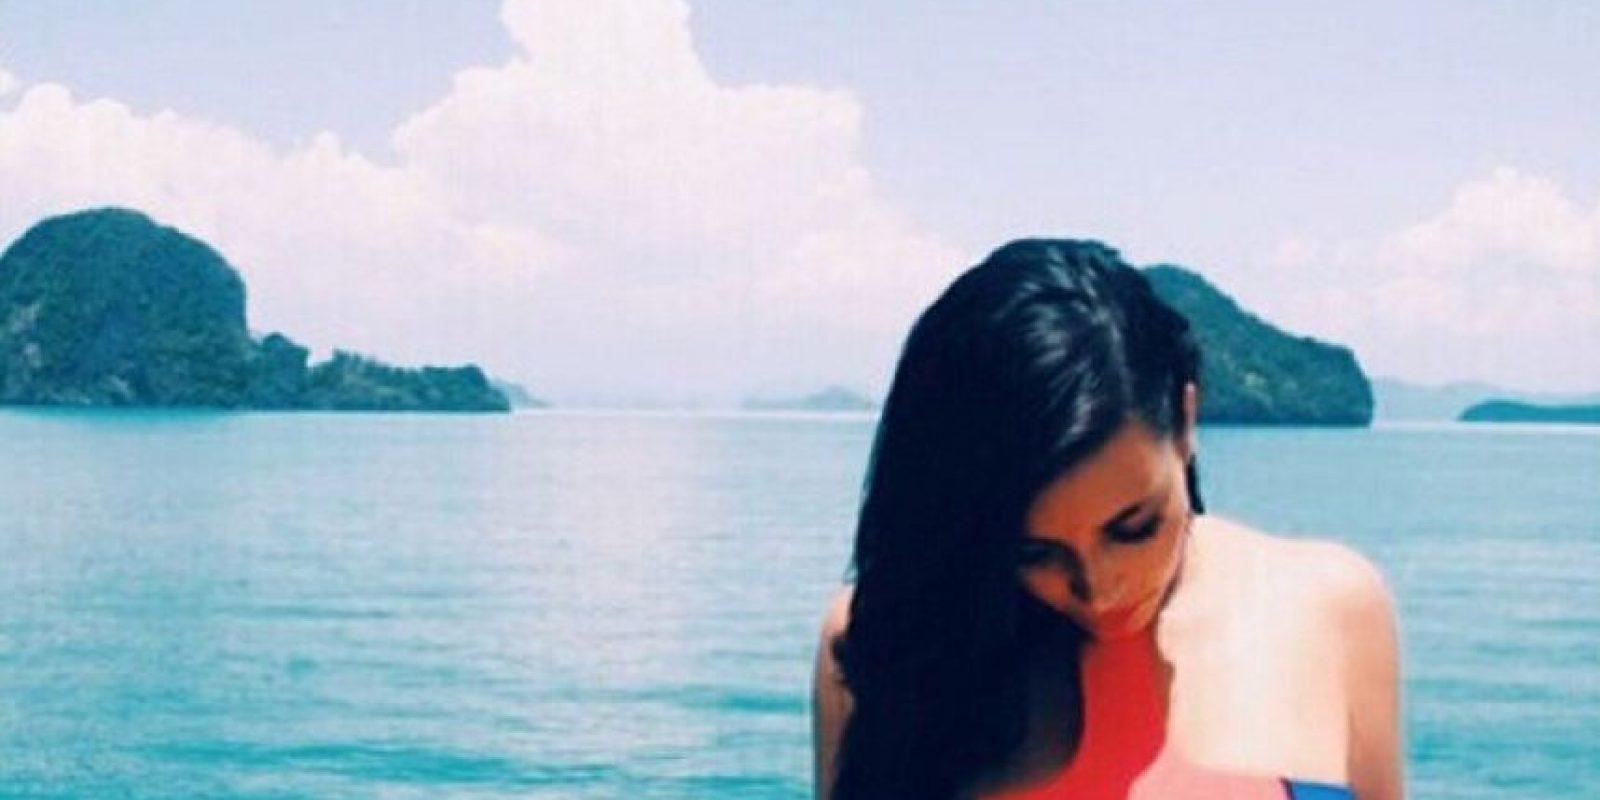 Le gusta presumir su cuerpo Foto:Instagram @kimkardashian